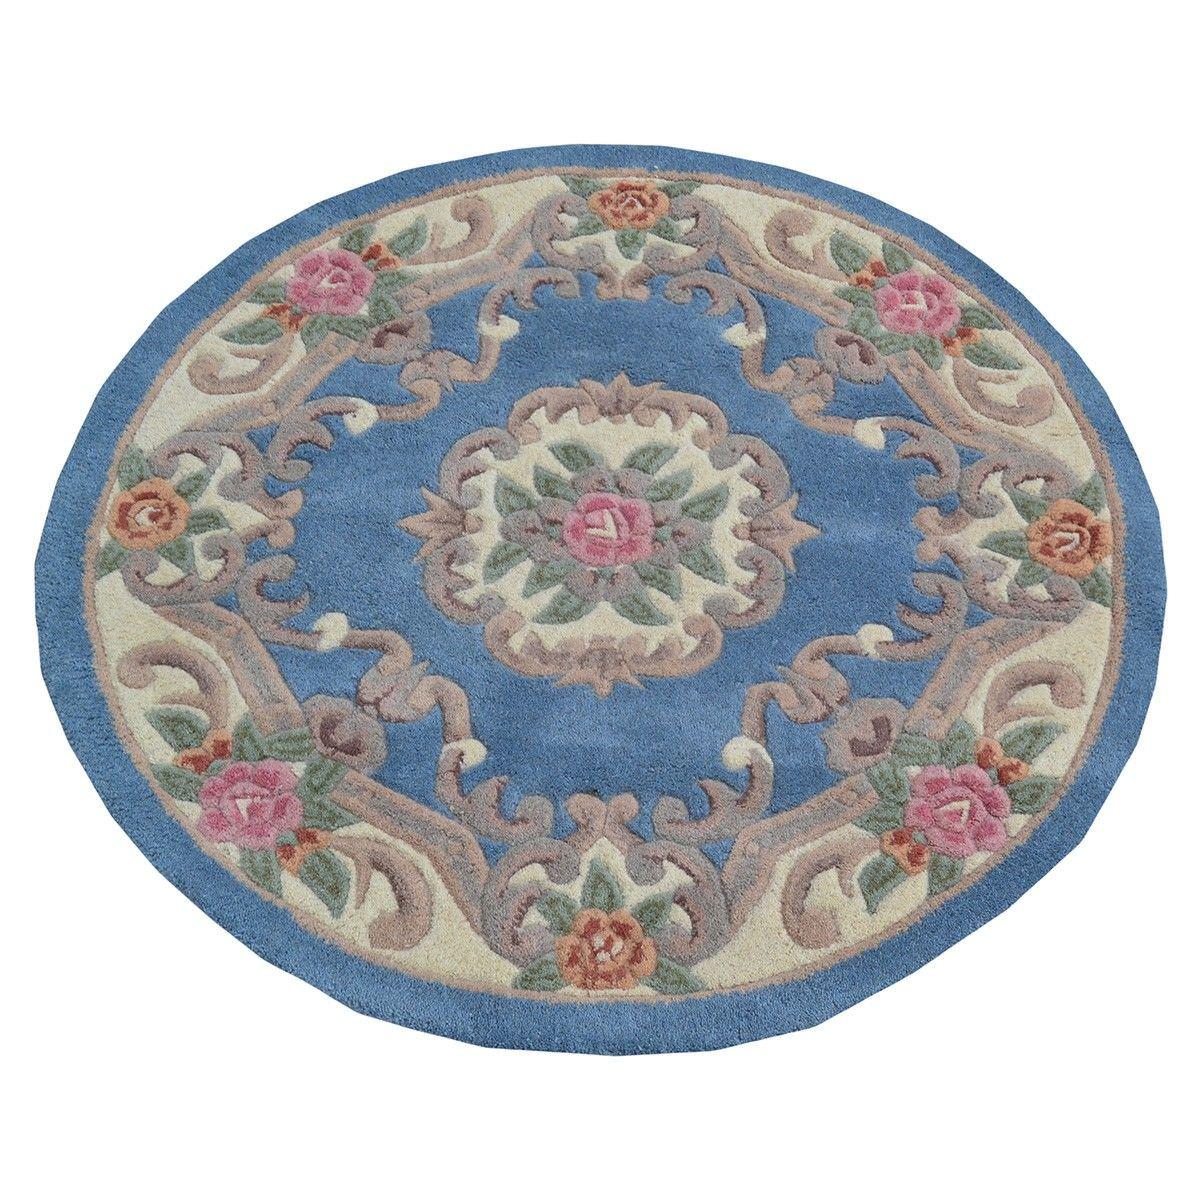 Avalon French Aubusson Round Wool Rug, 120cm, Blue